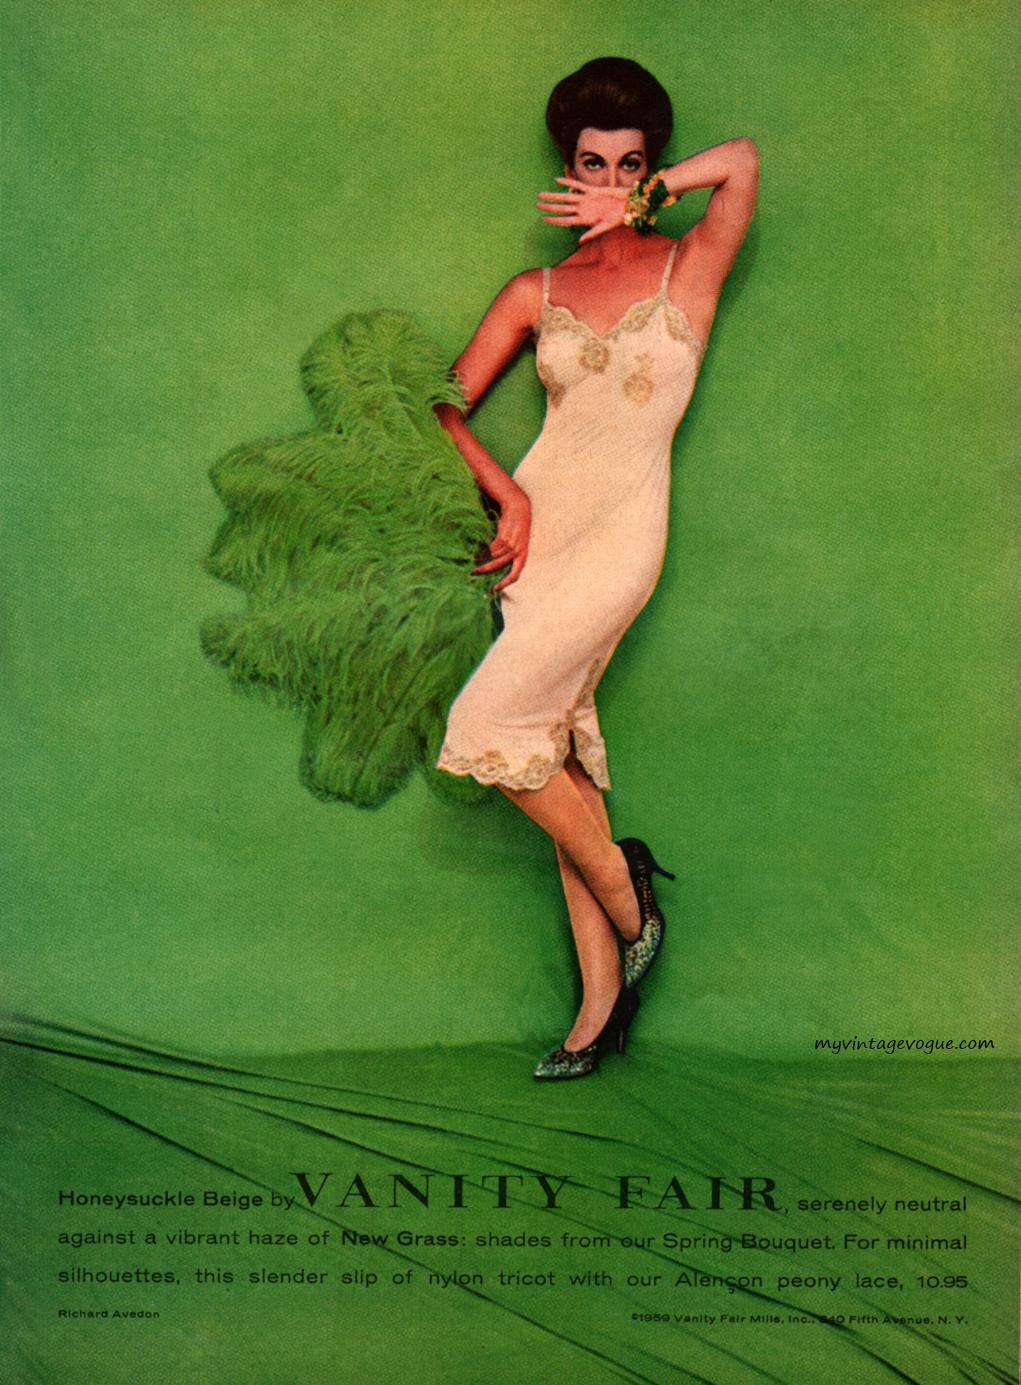 Vanity Fair 1959 - photo by Richard Avedon | via:  myvintagevogue